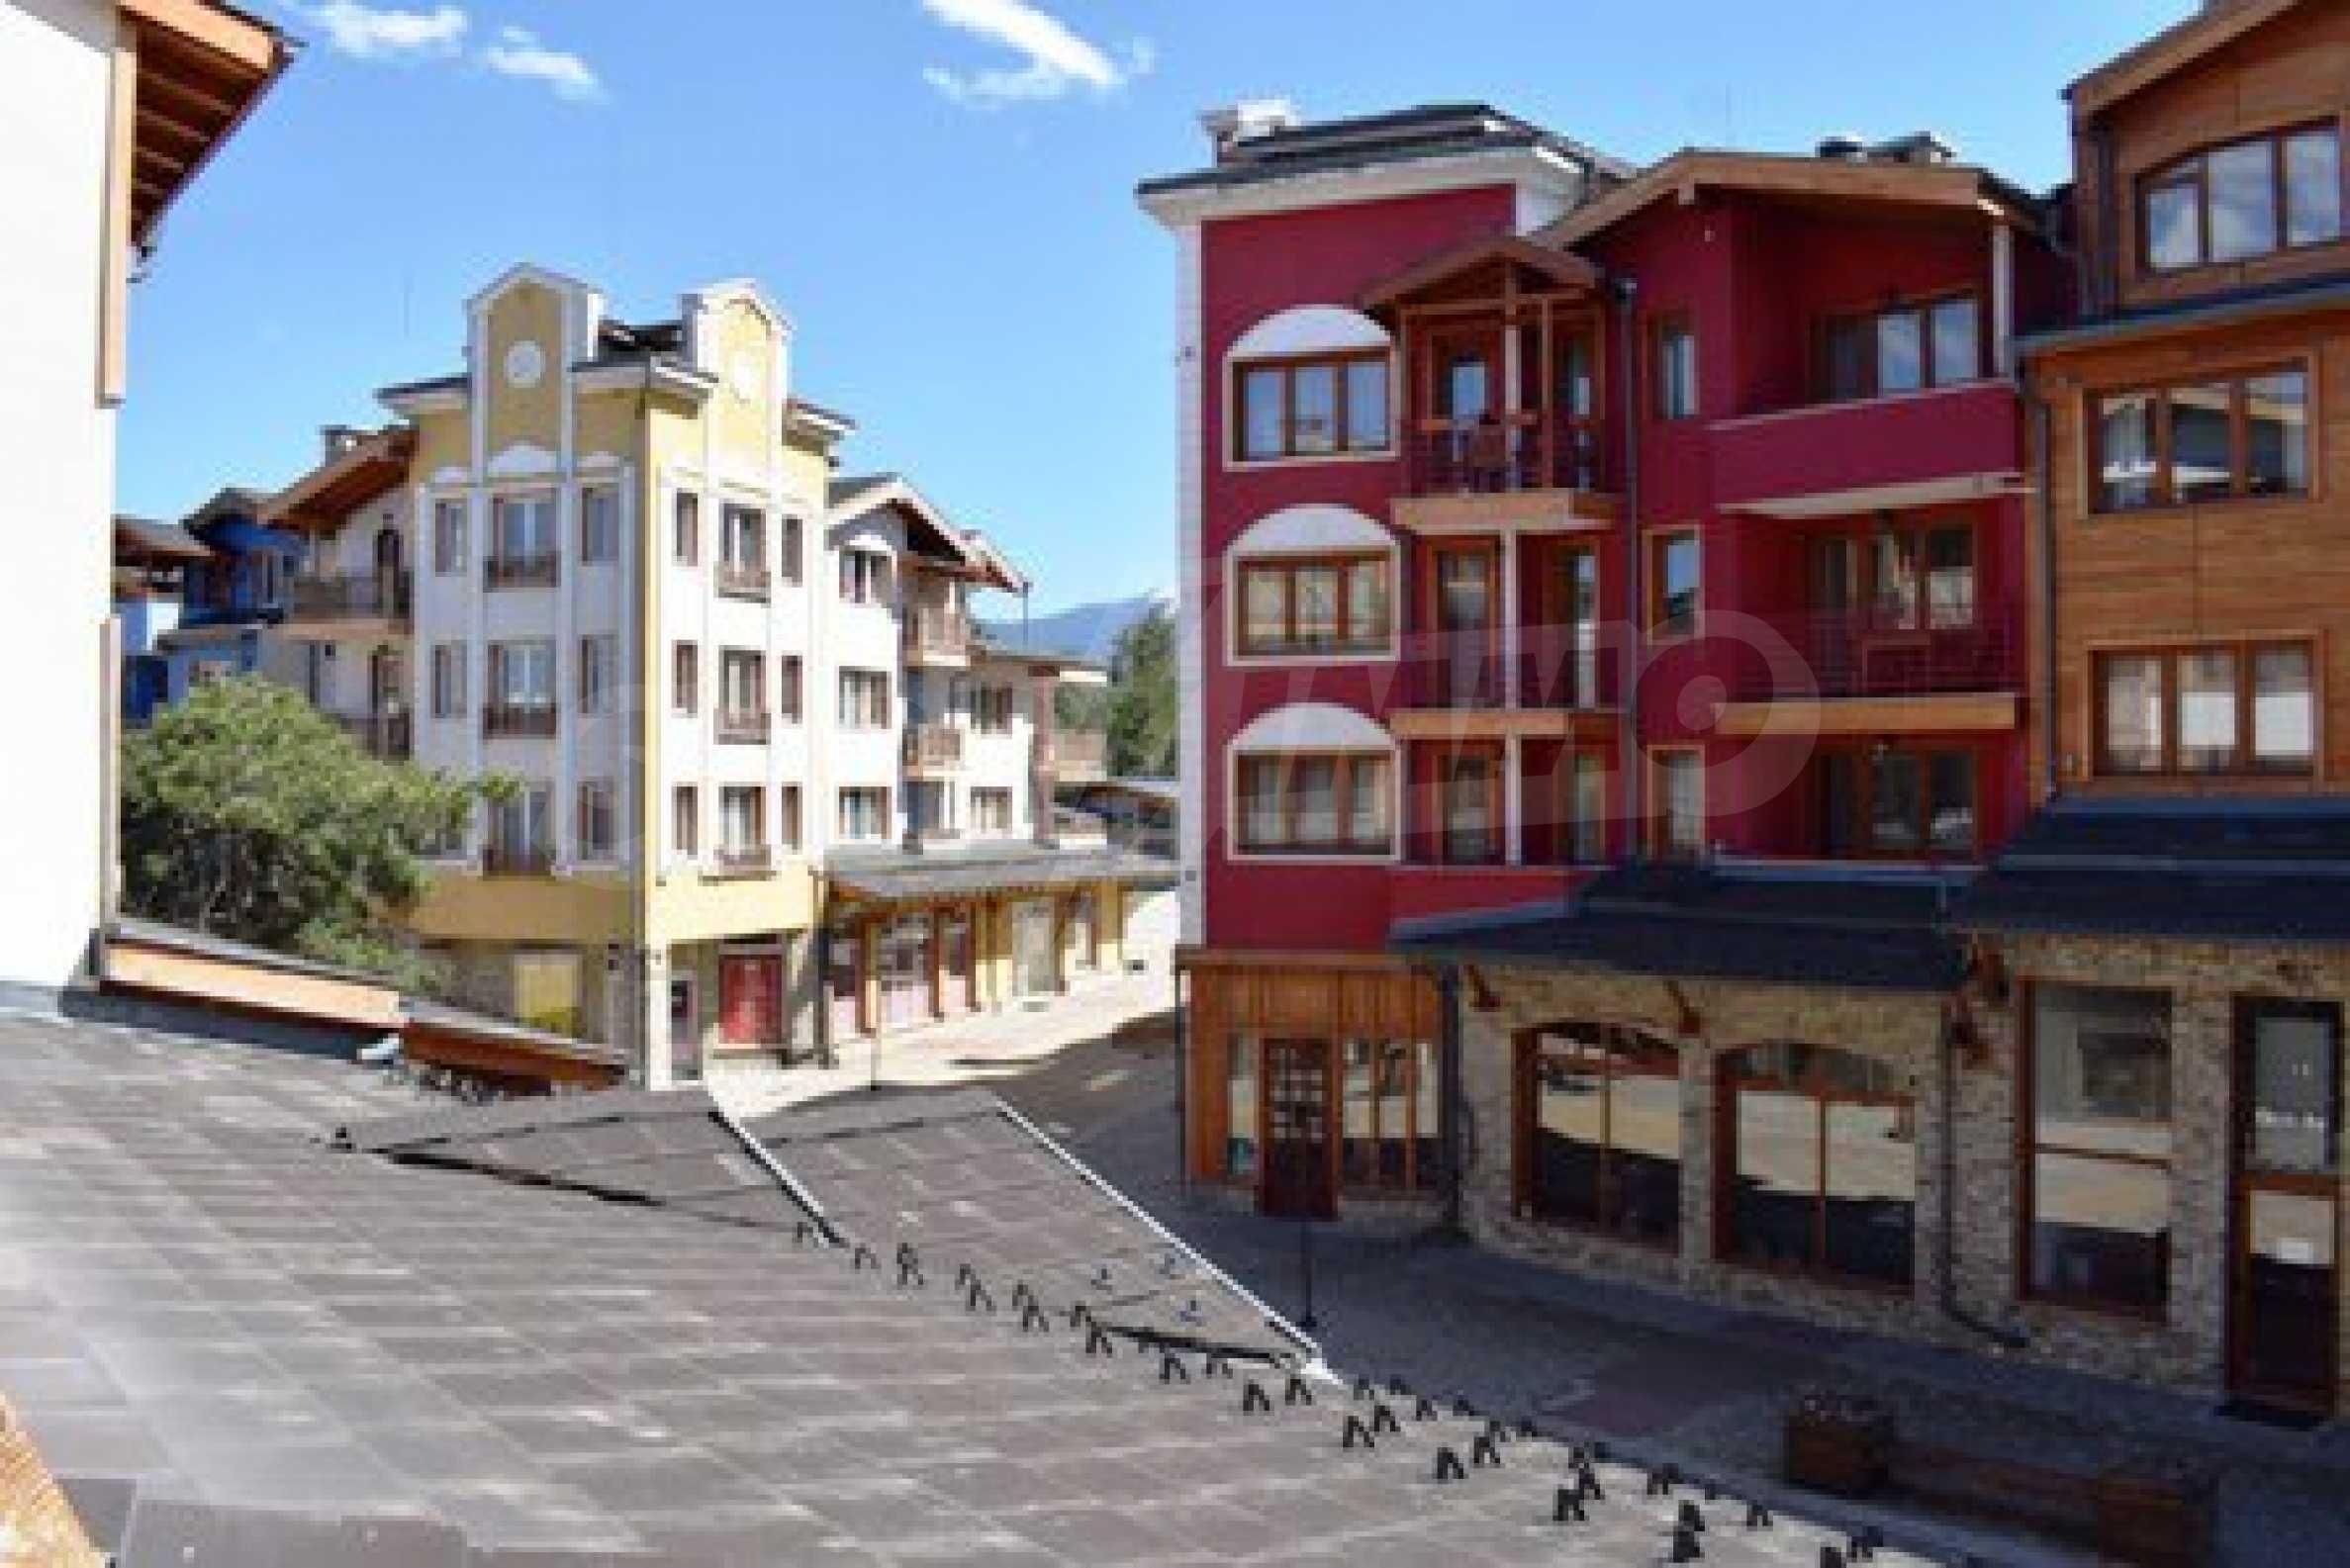 Двустаен апартамент в близост до голф клуб в района на Банско и Разлог 8